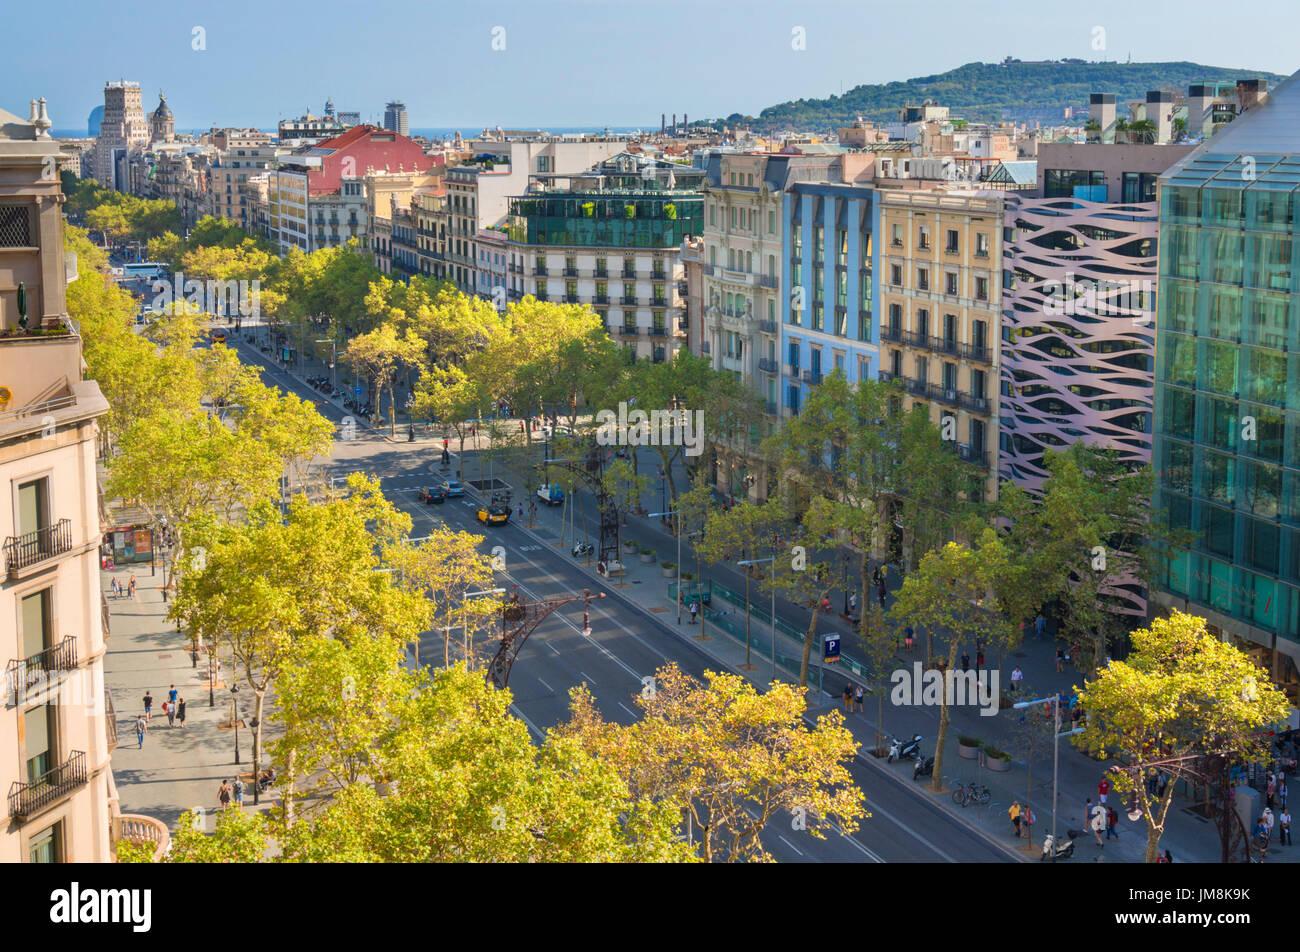 Barcelone Espagne Catalunya bordée d'occupé l'avenue Passeig de Gracia, dans le quartier L'Eixample de Barcelone Espagne eu Europe Catalogne Photo Stock